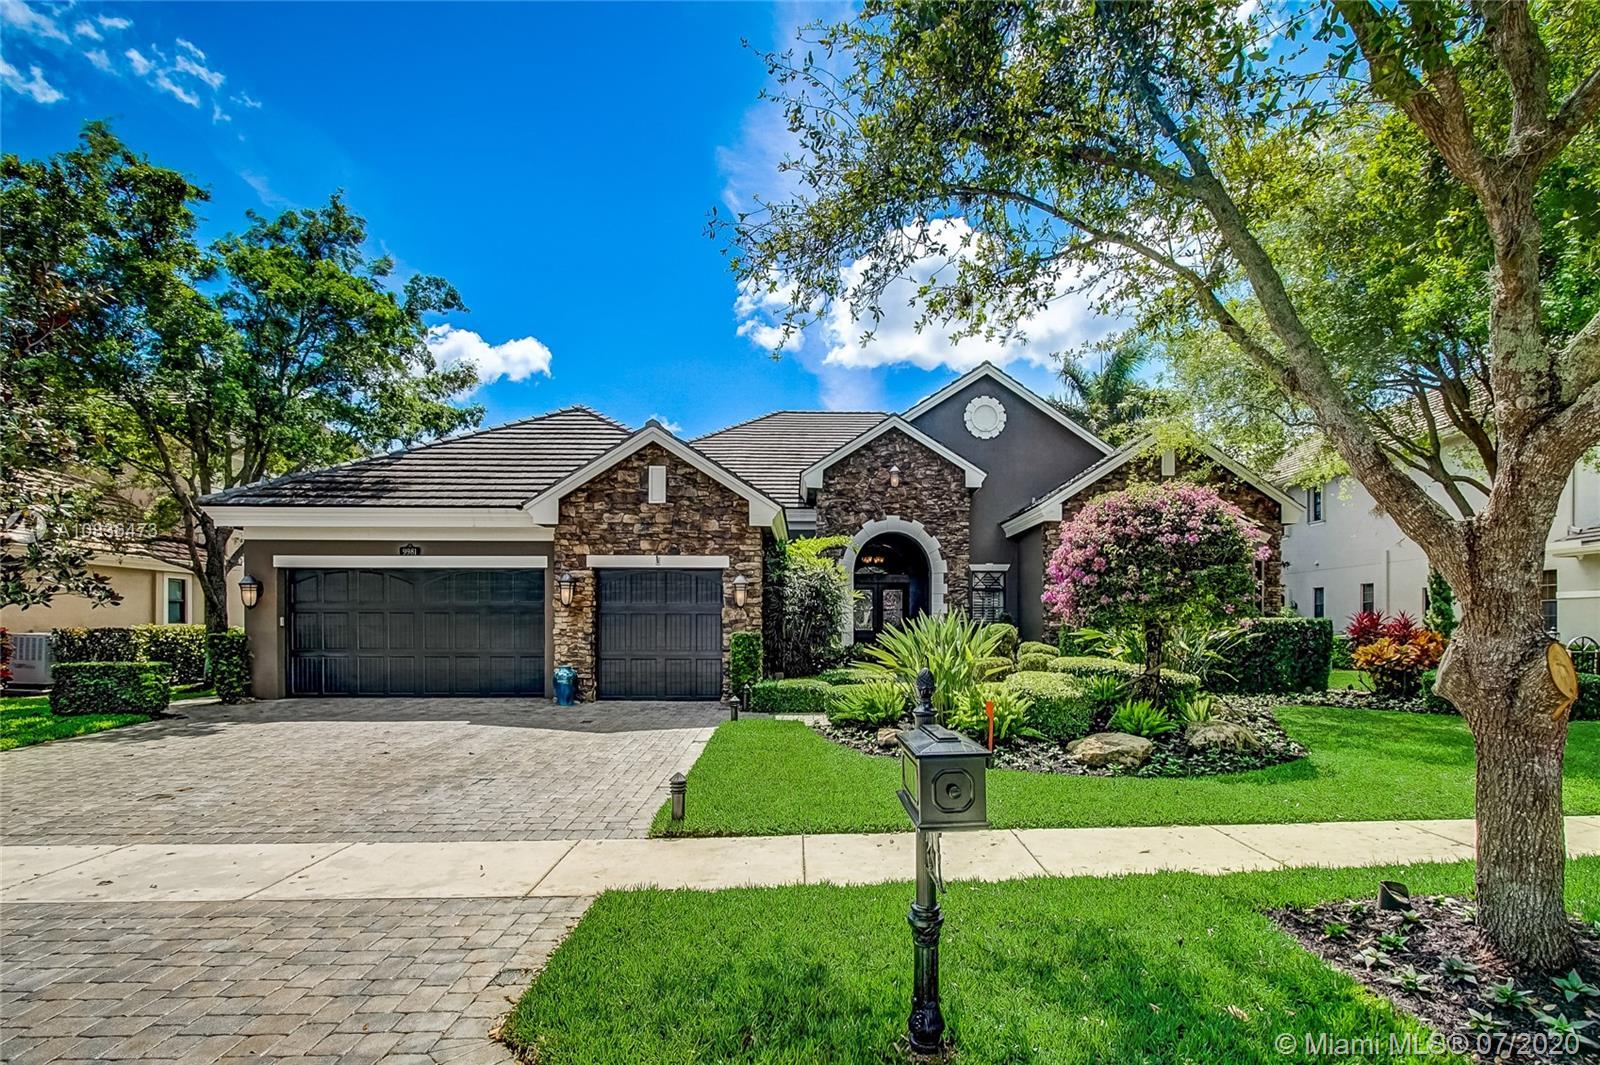 9981 Equus Cir Property Photo - Boynton Beach, FL real estate listing